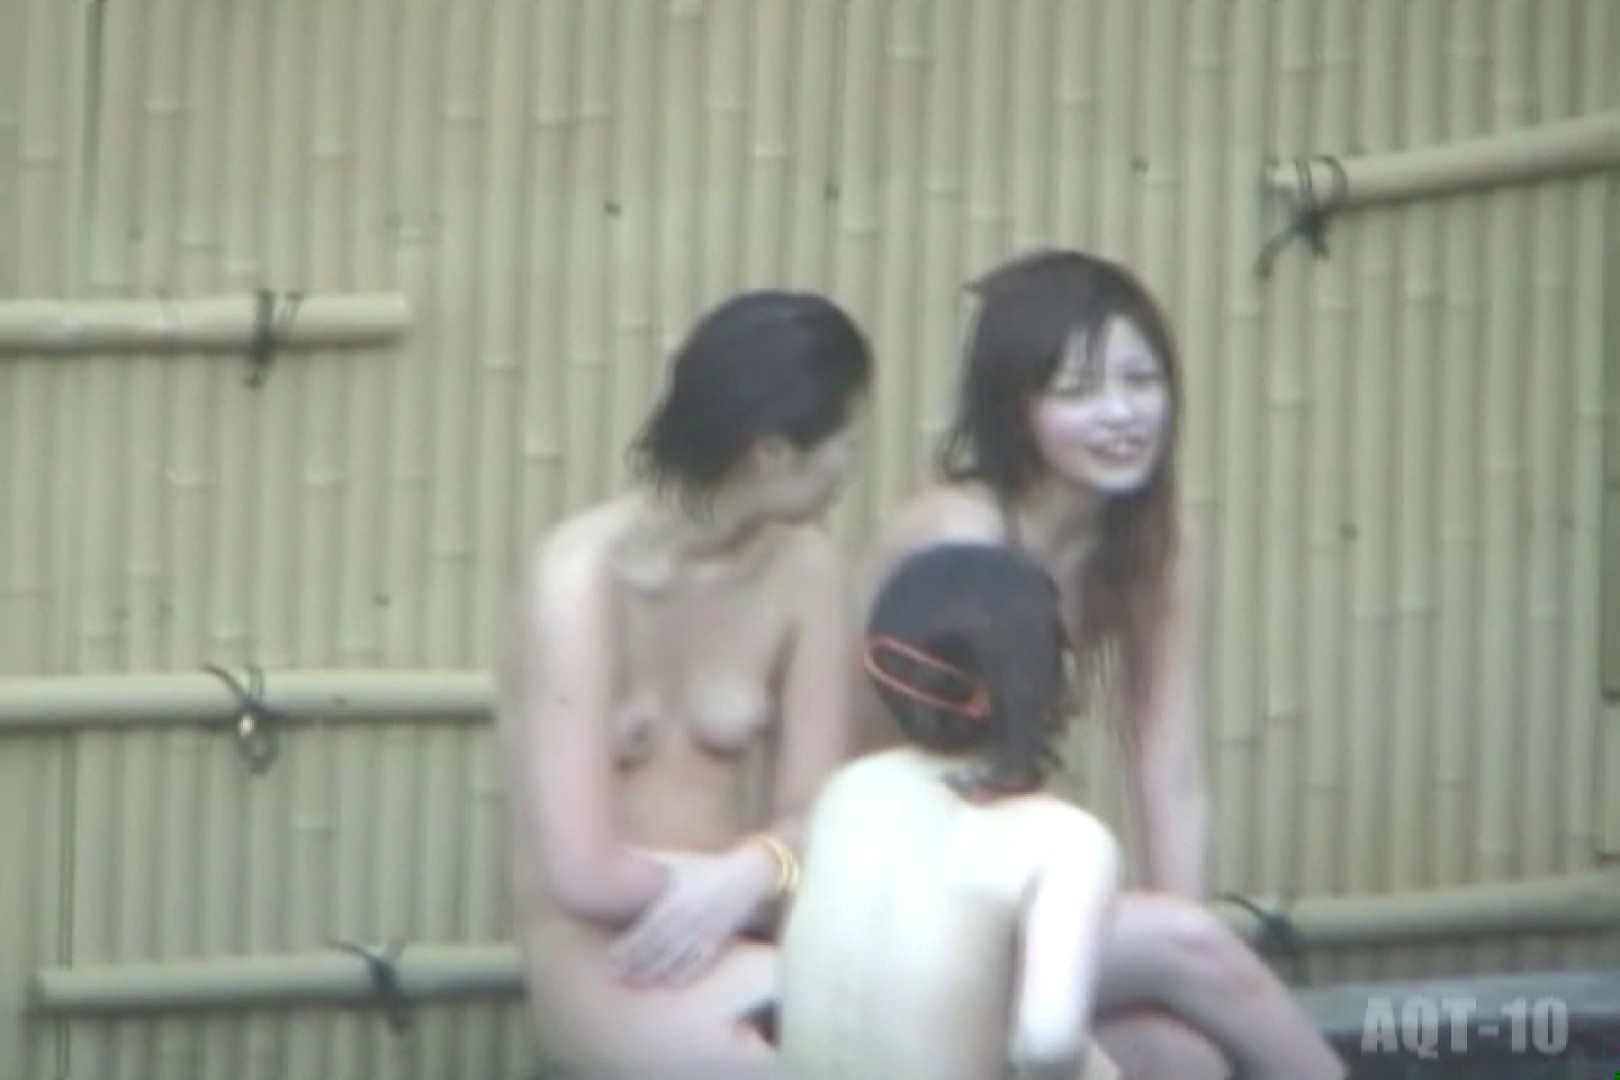 Aquaな露天風呂Vol.790 OLのプライベート  13pic 6